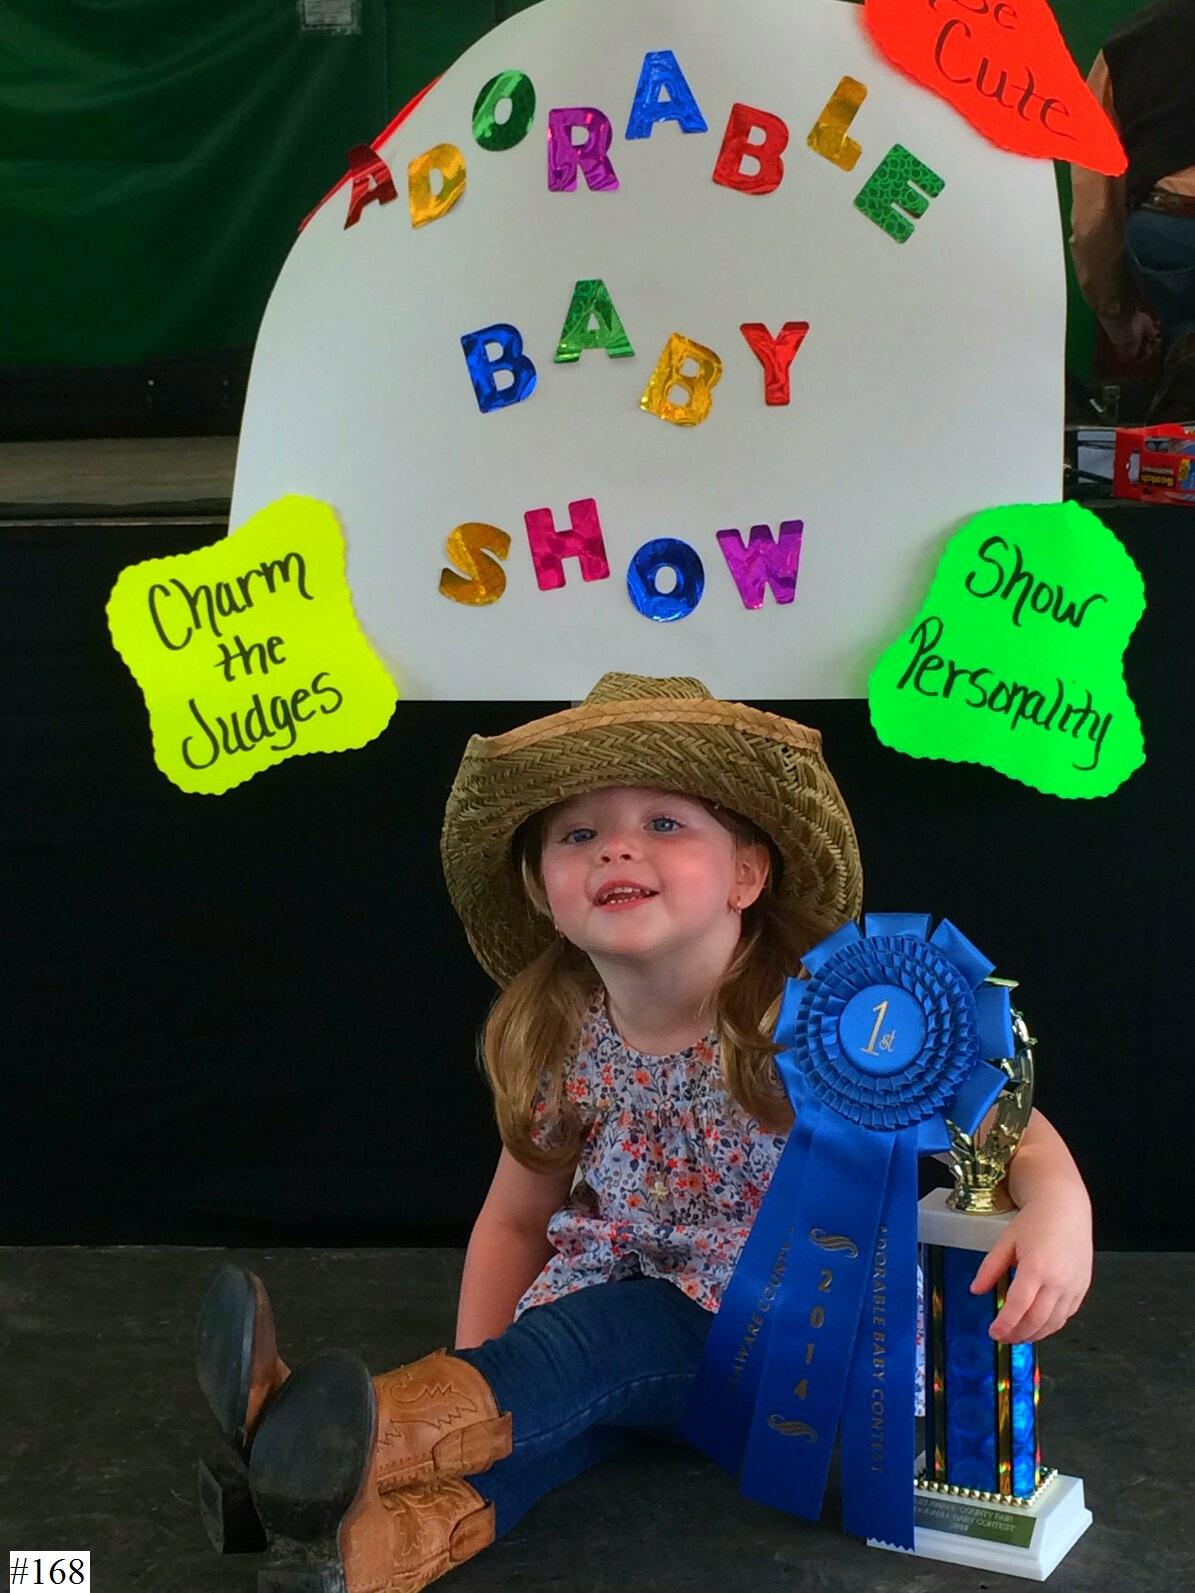 Delaware County Fair image 7